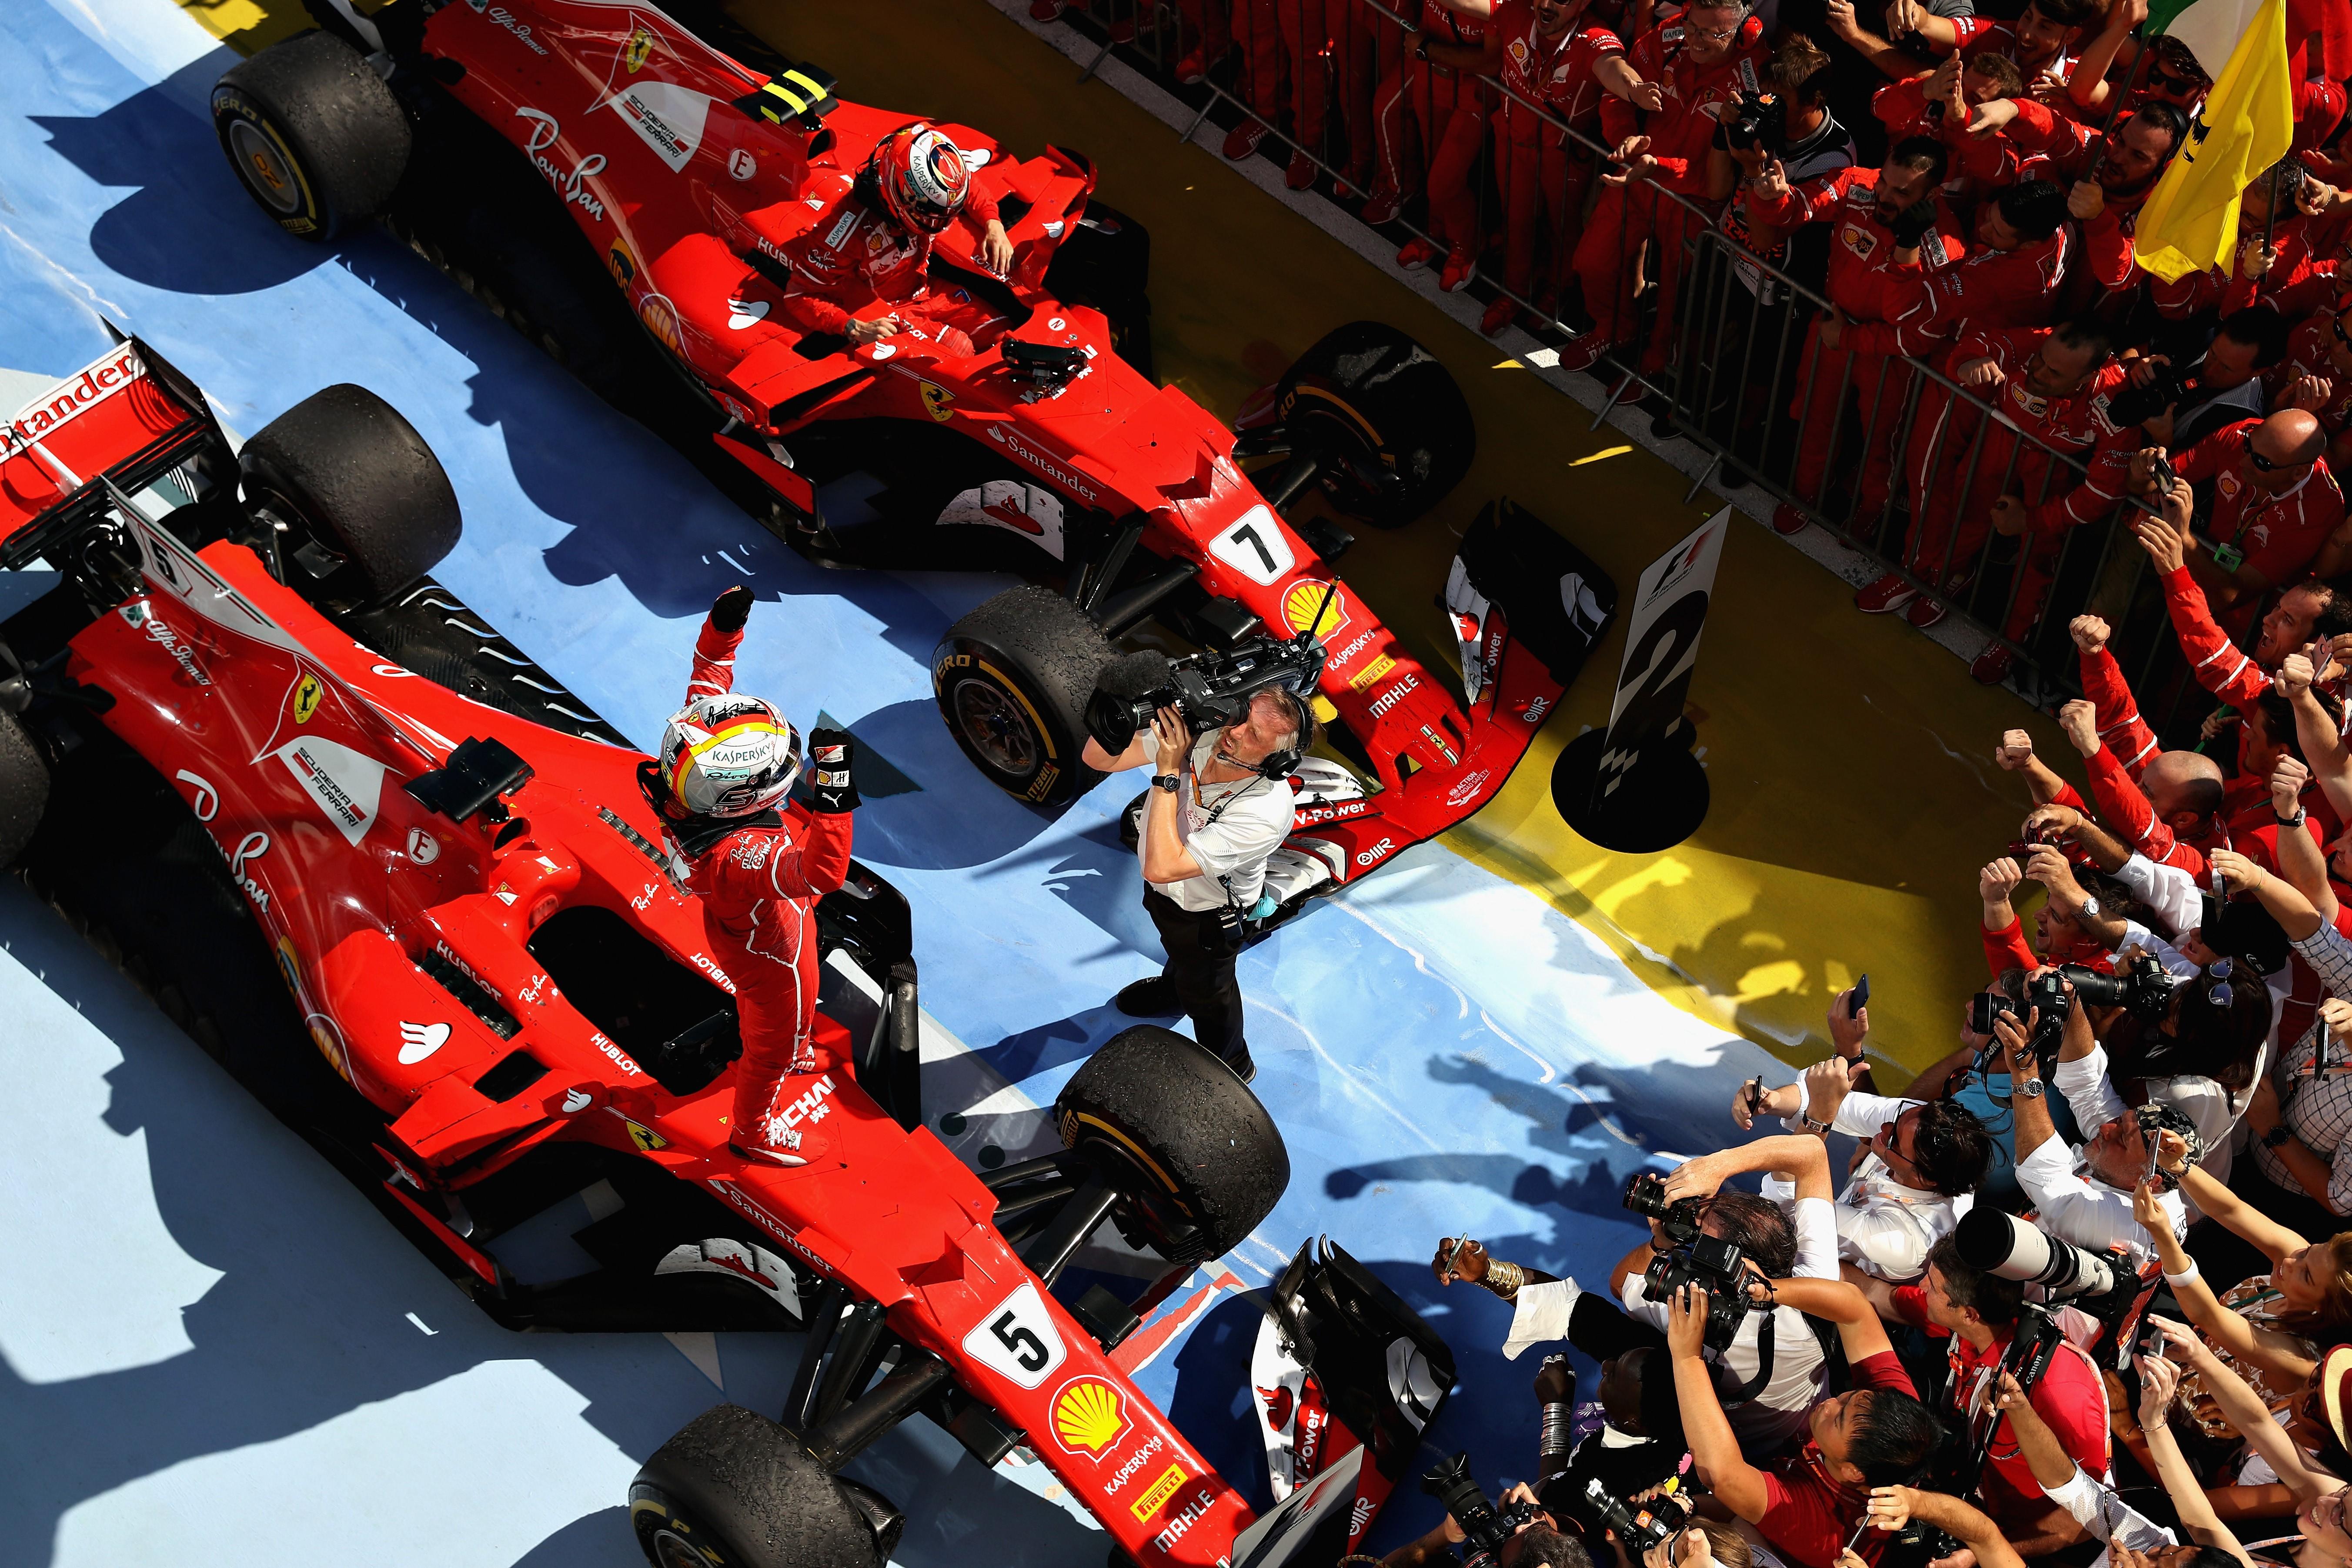 Sebastian Vettel et Räikkönen (Ferrari) au Grand Prix de Hongrie 2017